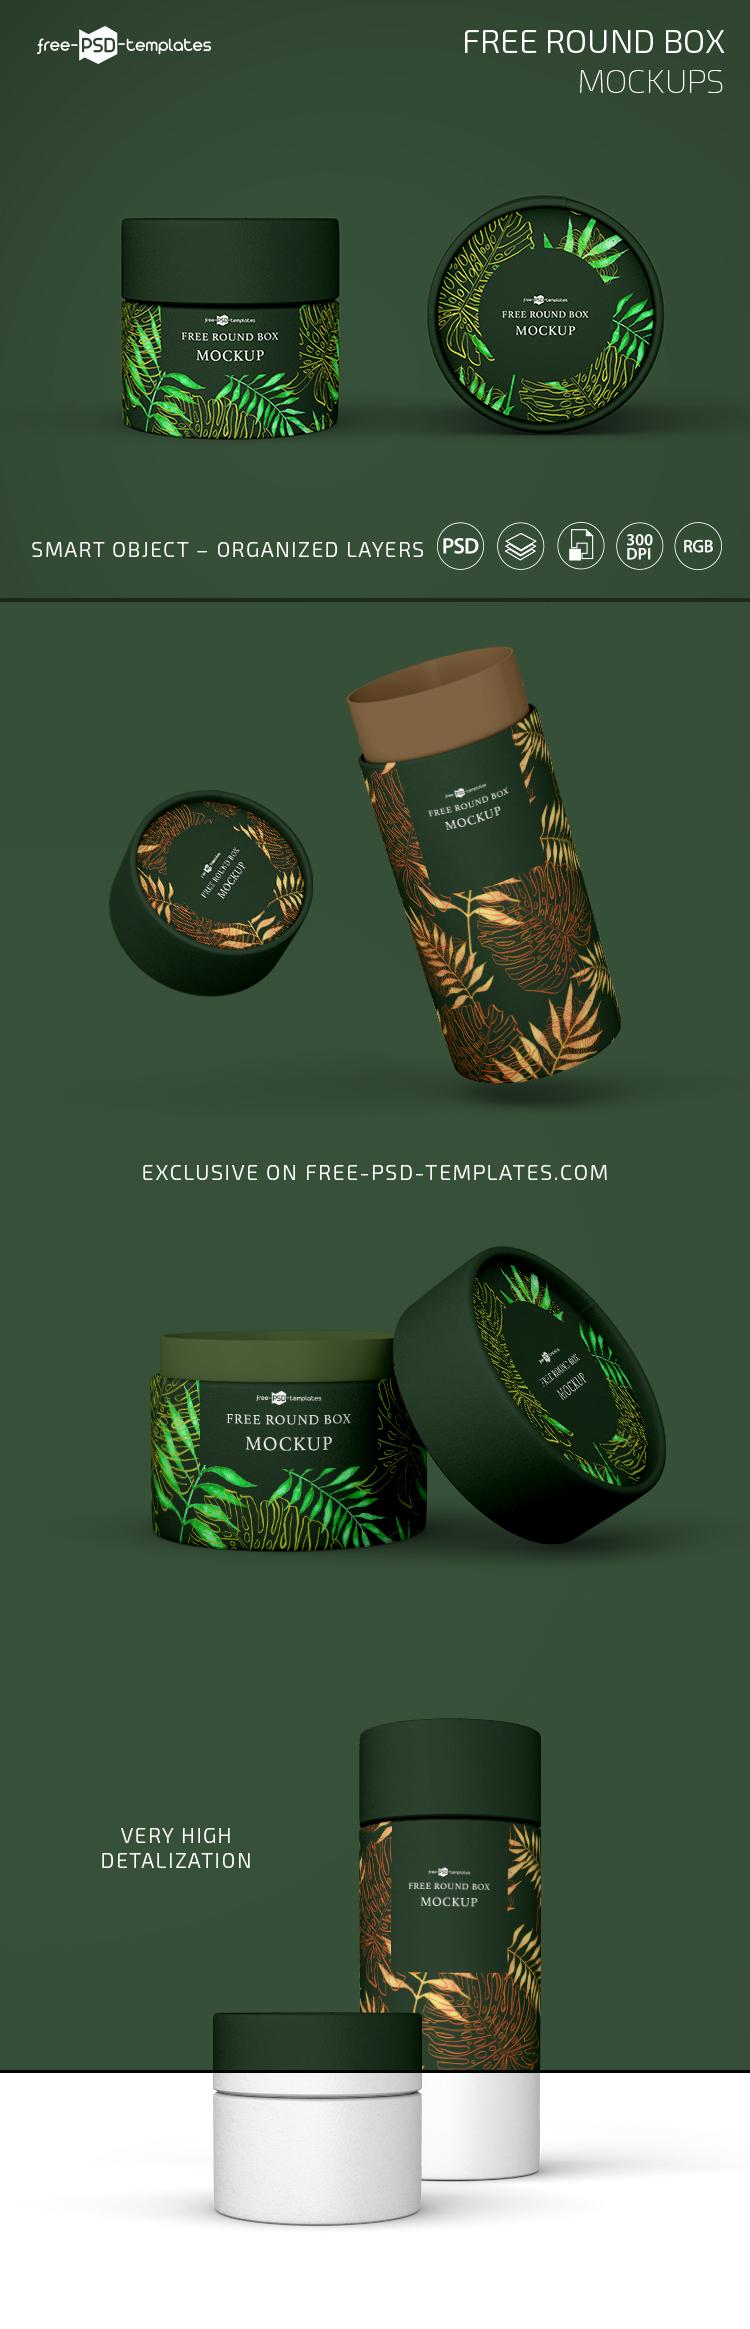 Download Free Round Box Mockup Set Free Psd Templates Box Mockup Free Packaging Mockup Psd Template Free